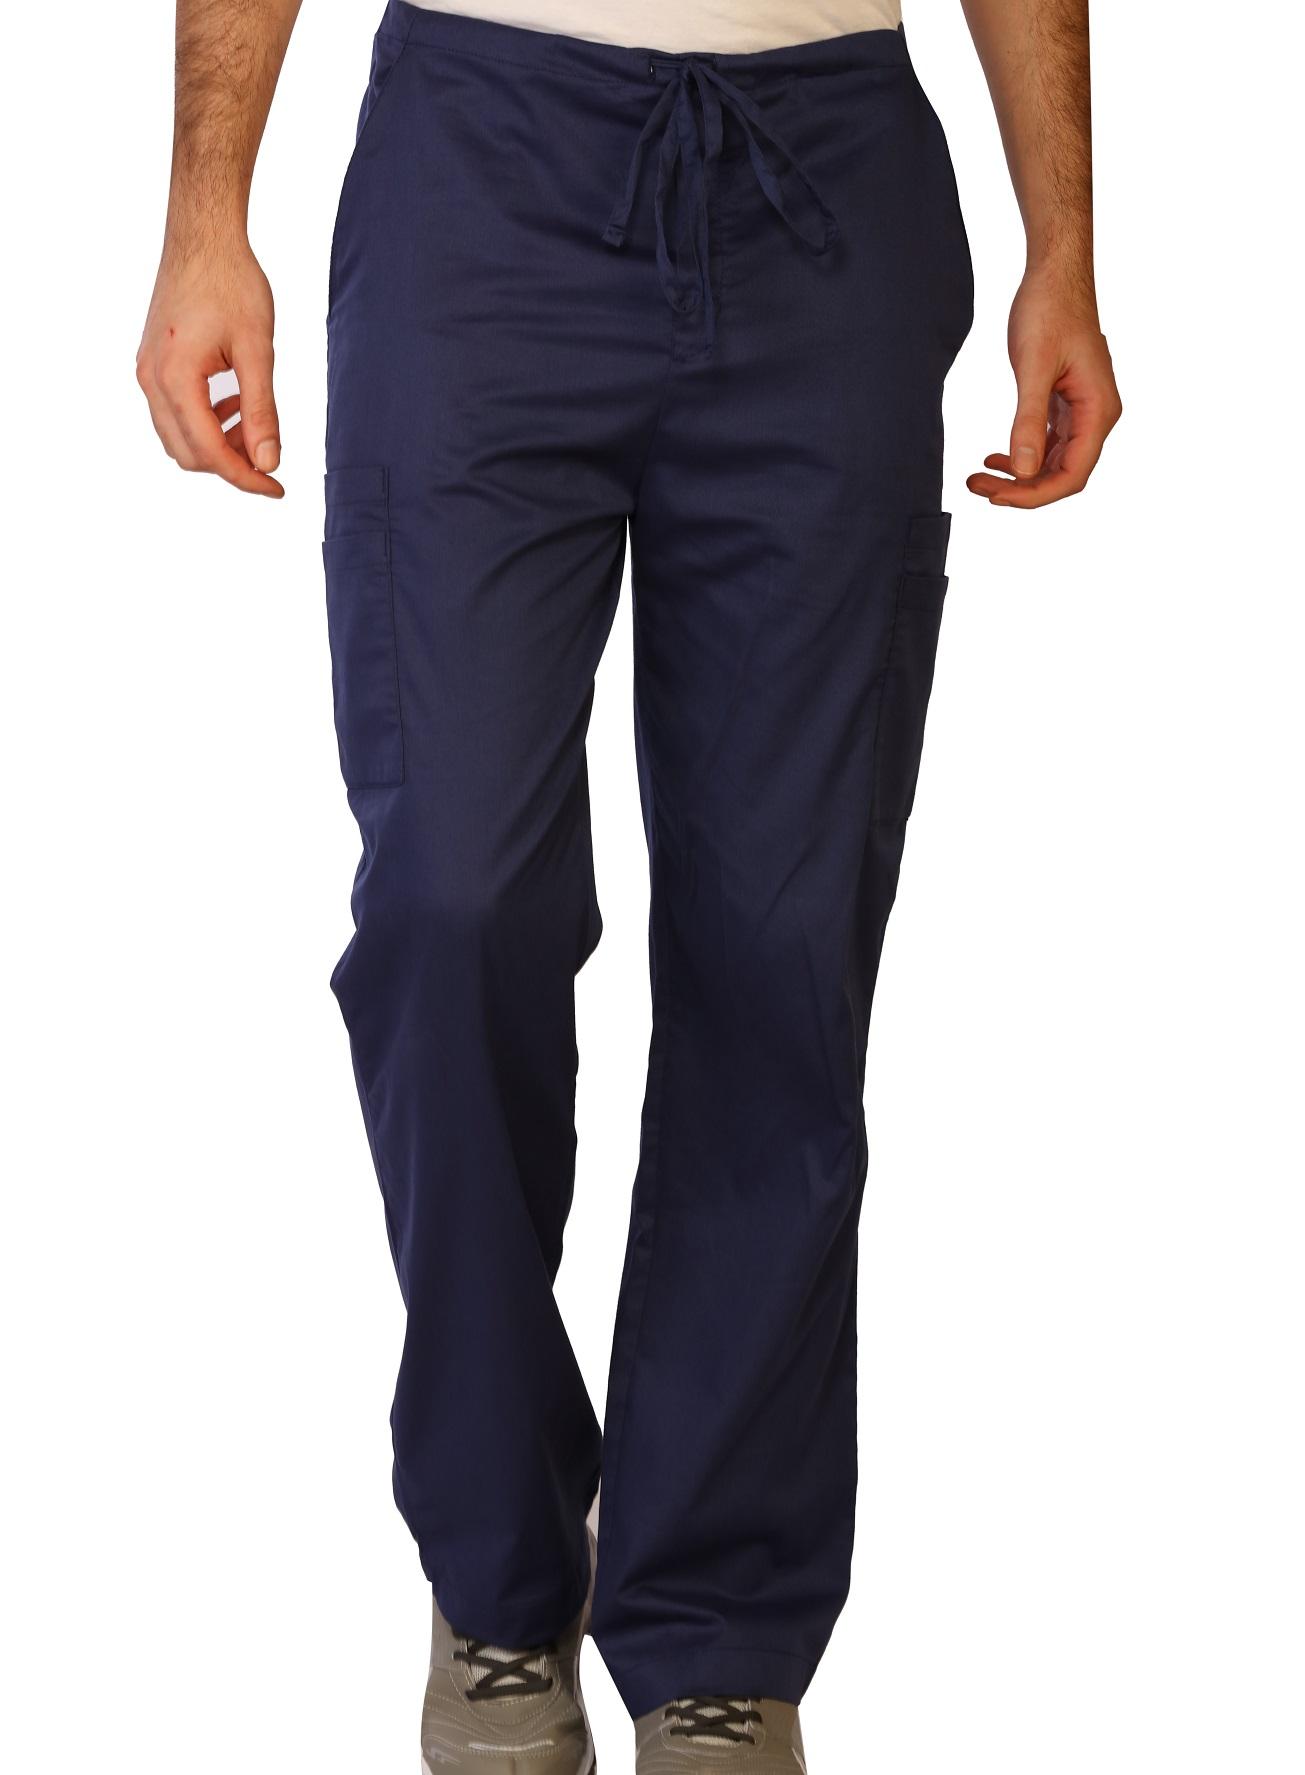 Men's Stretch Double Cargo Scrub Pants, LifeThreads Contego Collection